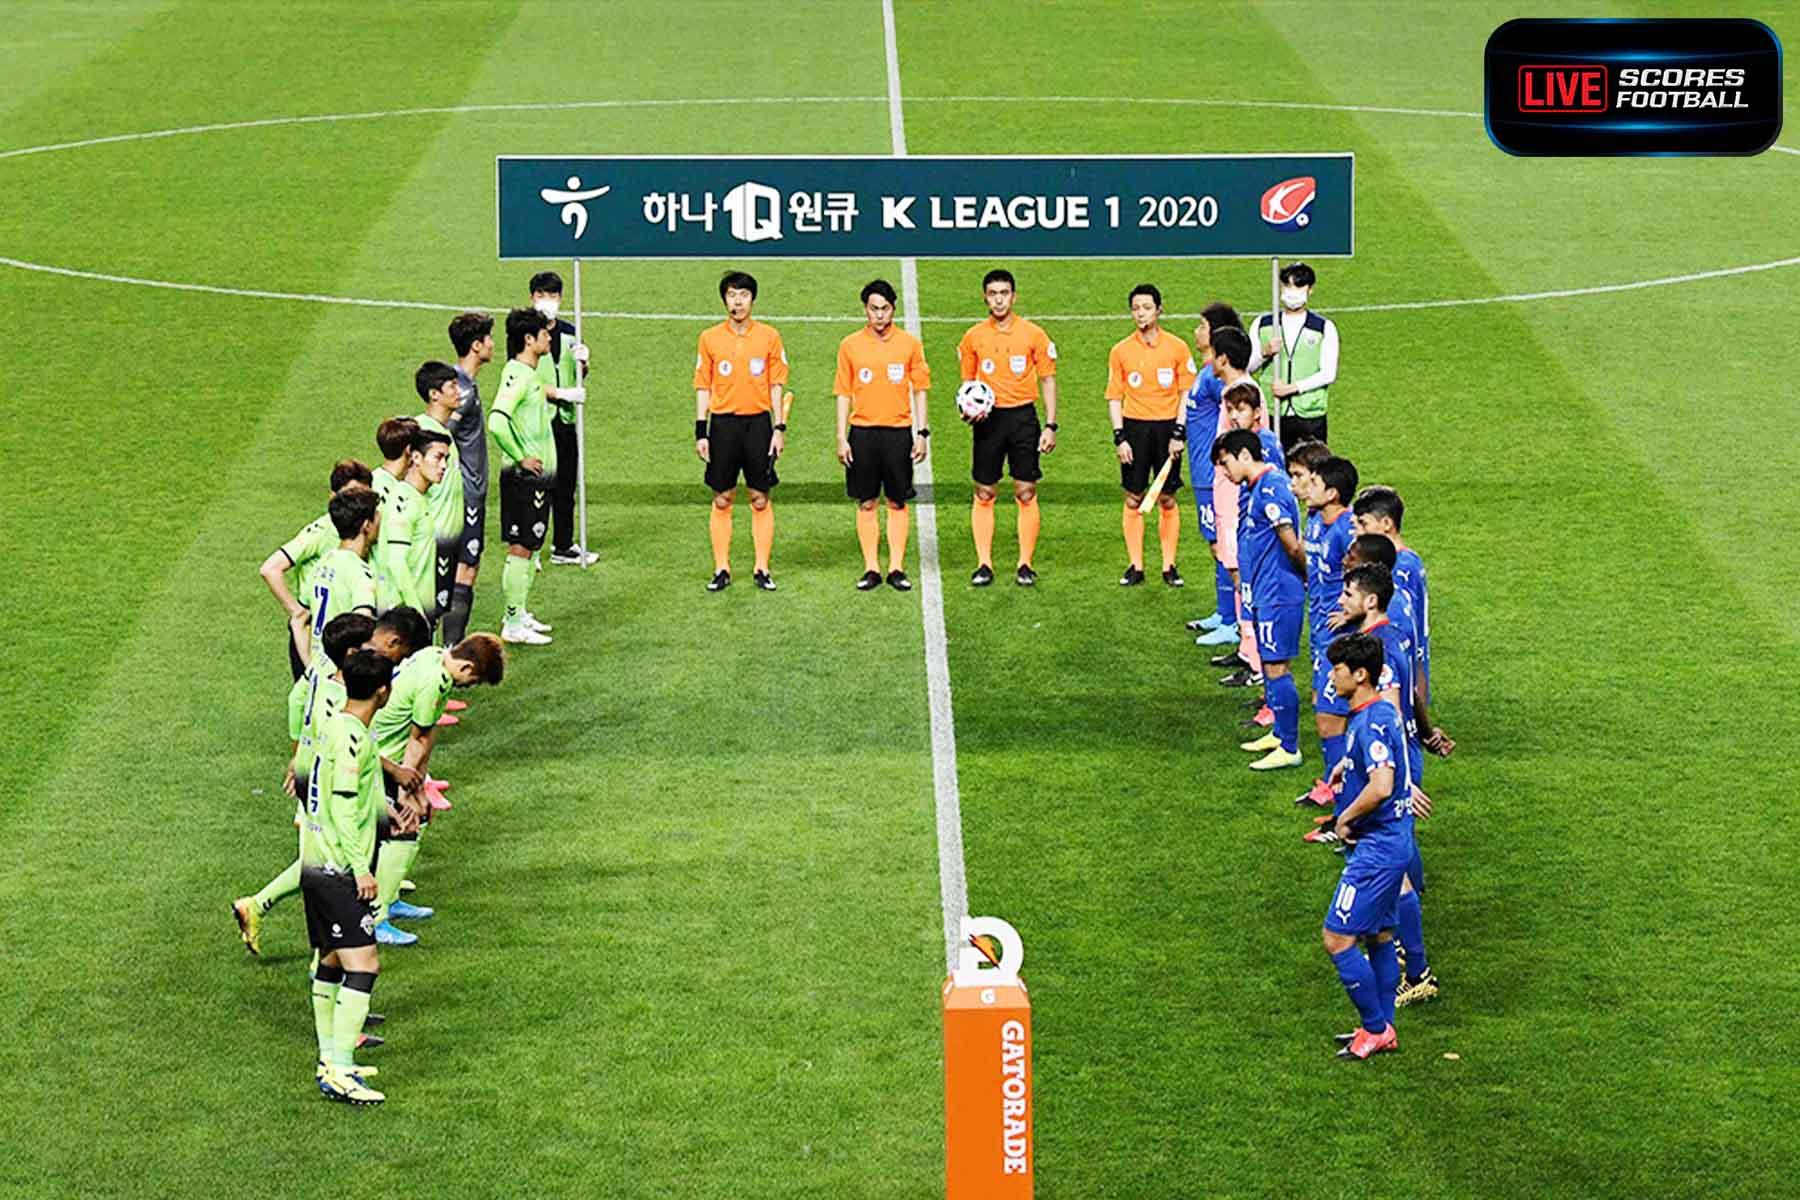 Read more about the article ฟุตบอลเกาหลีใต้เริ่มแข่งขันได้แล้วในวันที่ 8 พ.ค.63